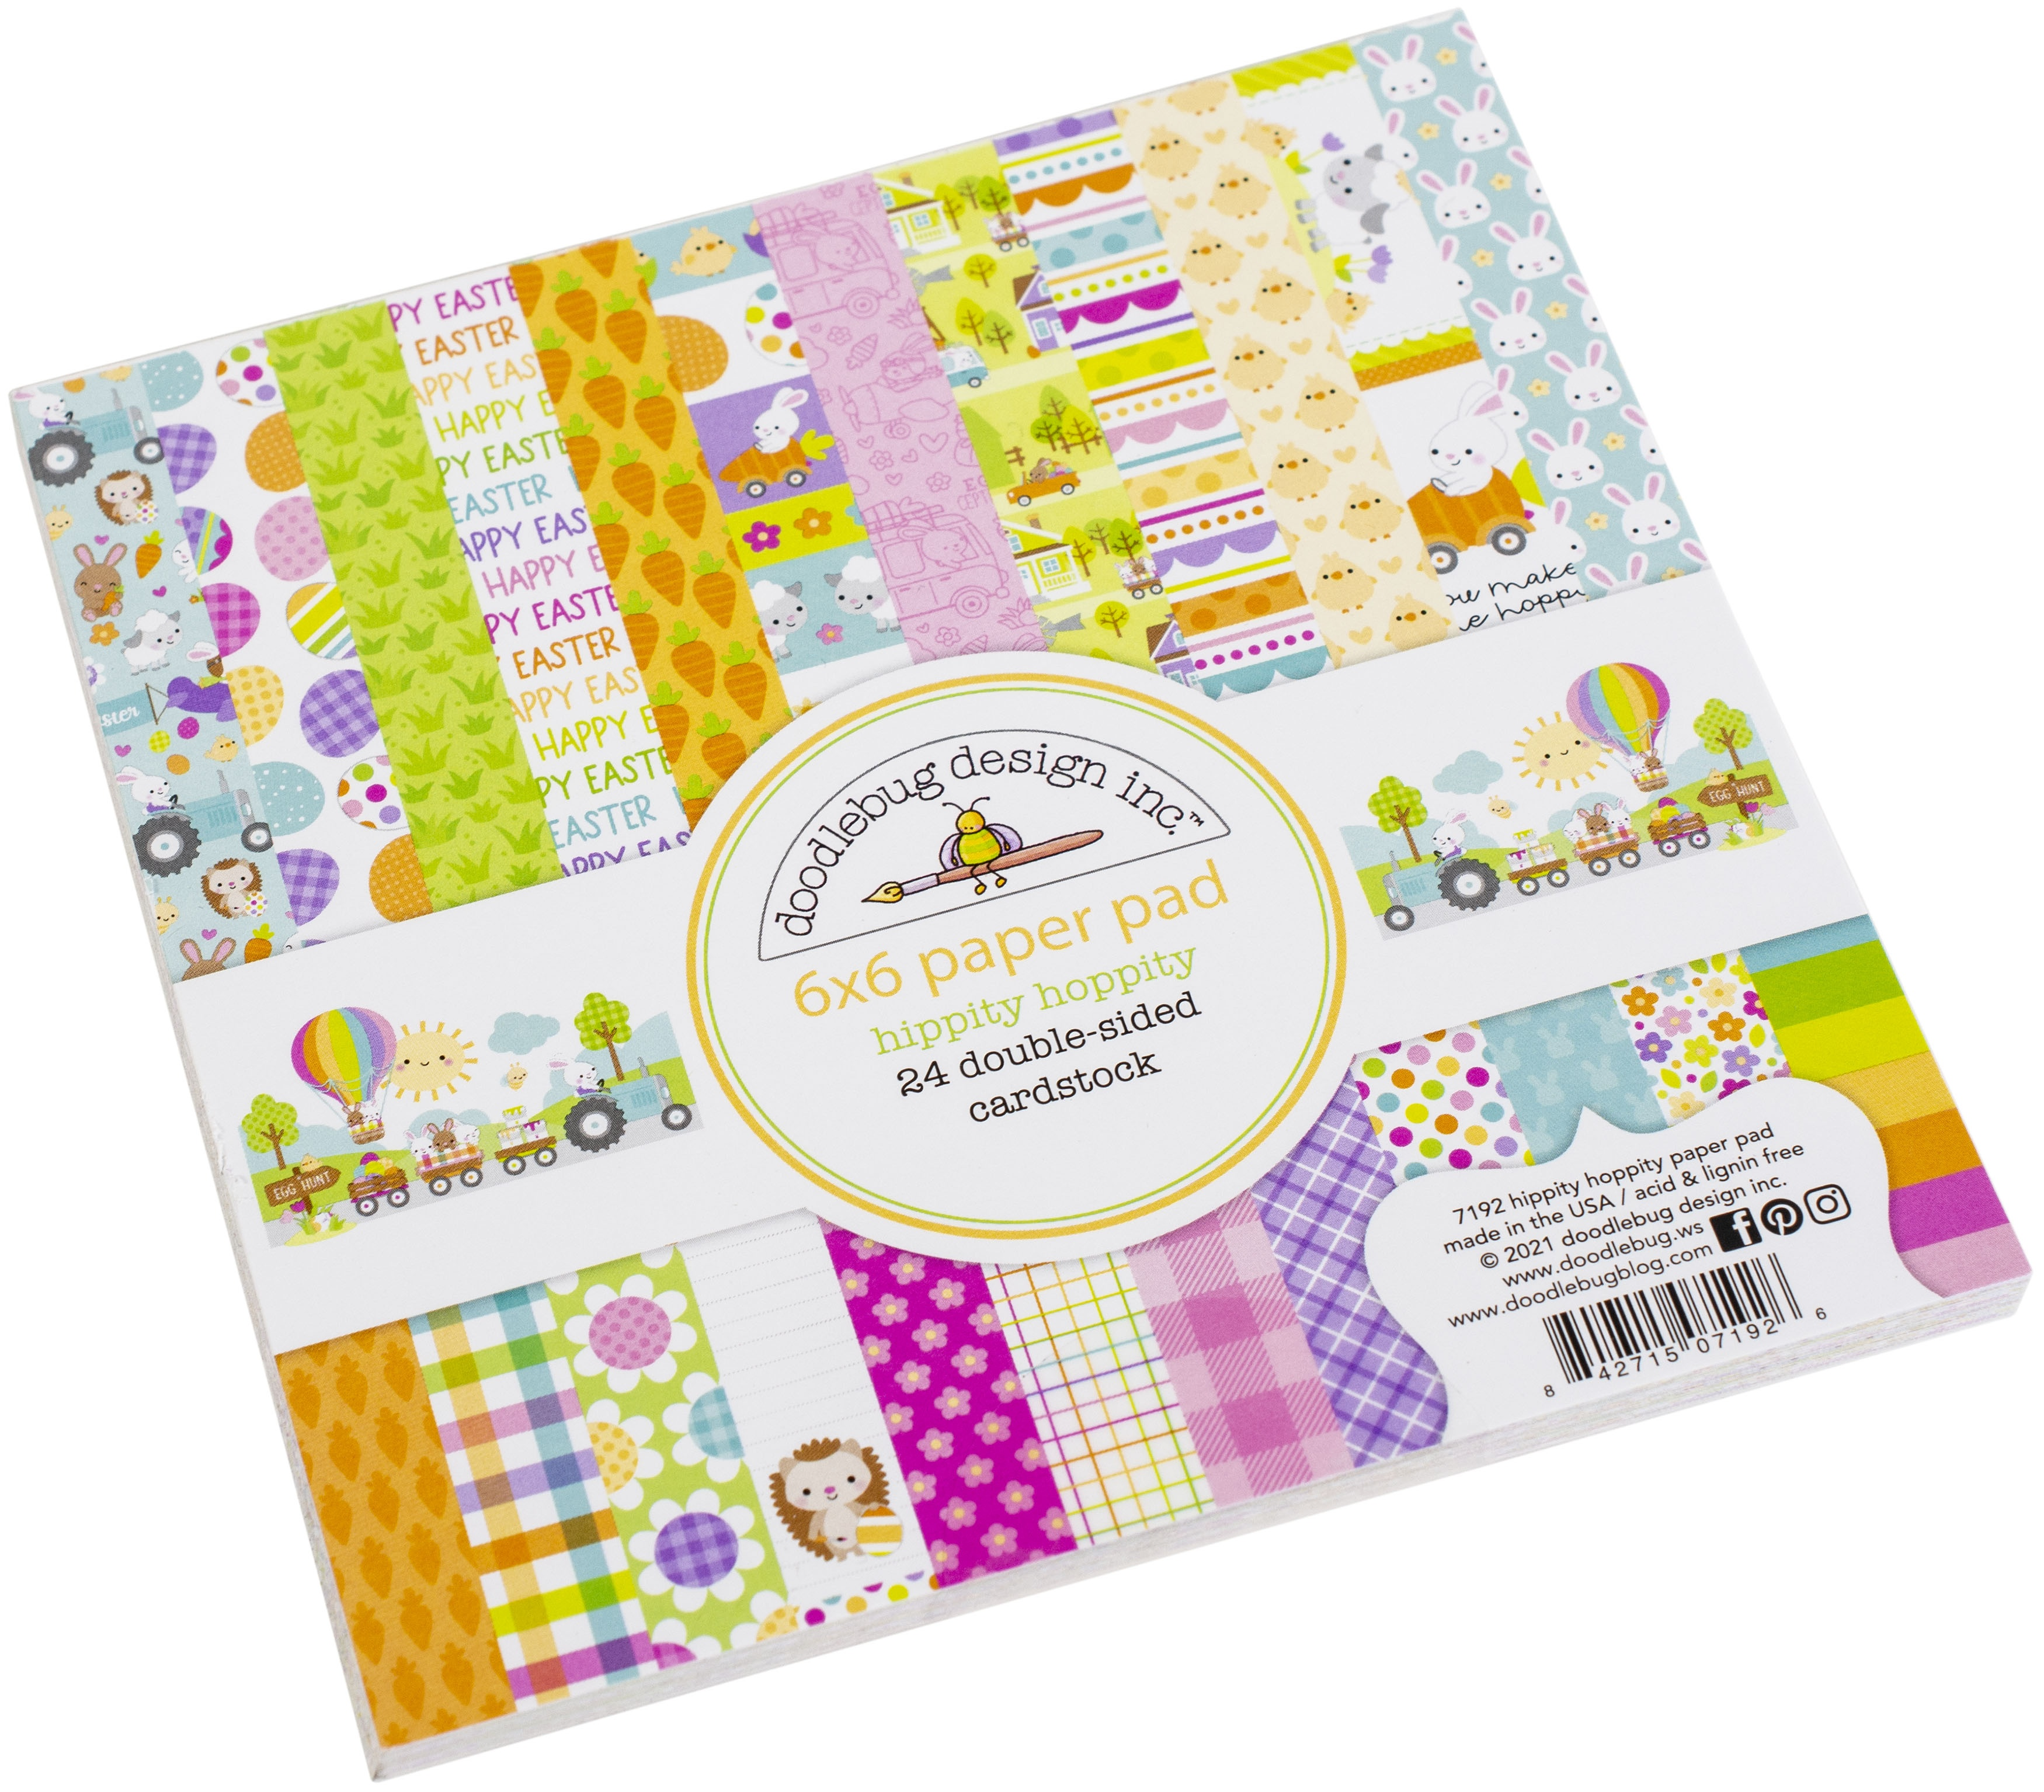 Doodlebug Double-Sided Paper Pad 6X6 24/Pkg-Hippity Hoppity, 12 Designs/2 Each